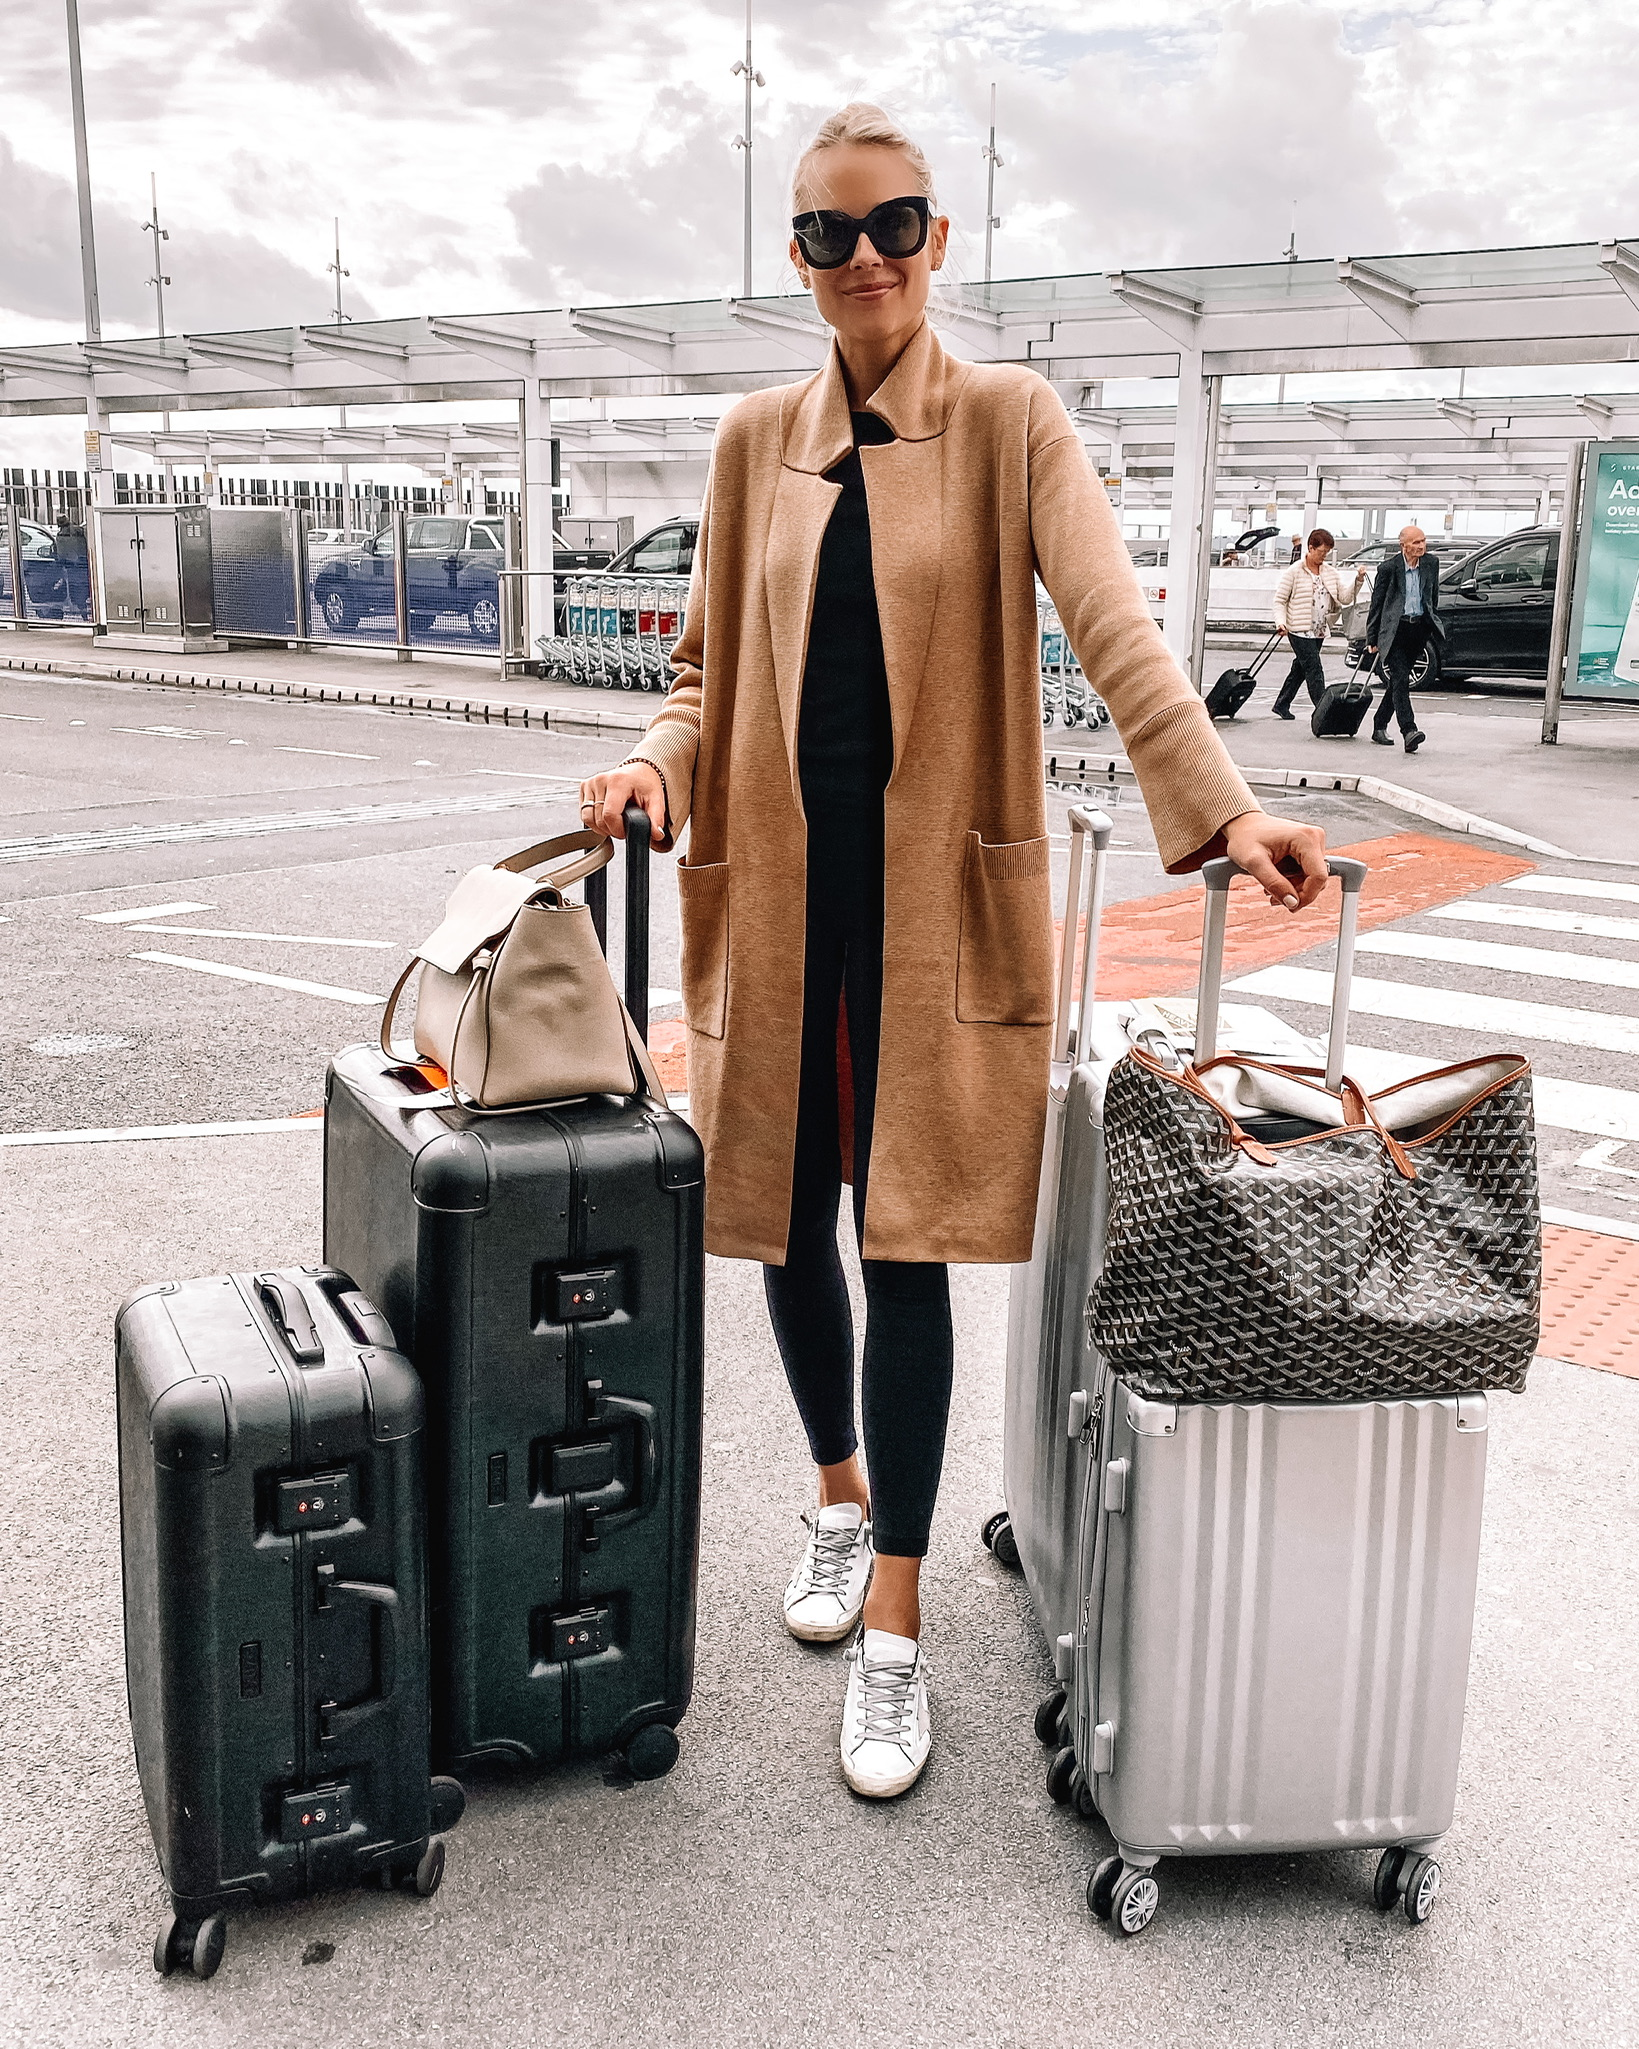 Fashion Jackson Wearing Camel Coatigan Black Leggings Golden Goose Sneakers Calpak Luggage Goyard Tote Airport Outfit Travel Style